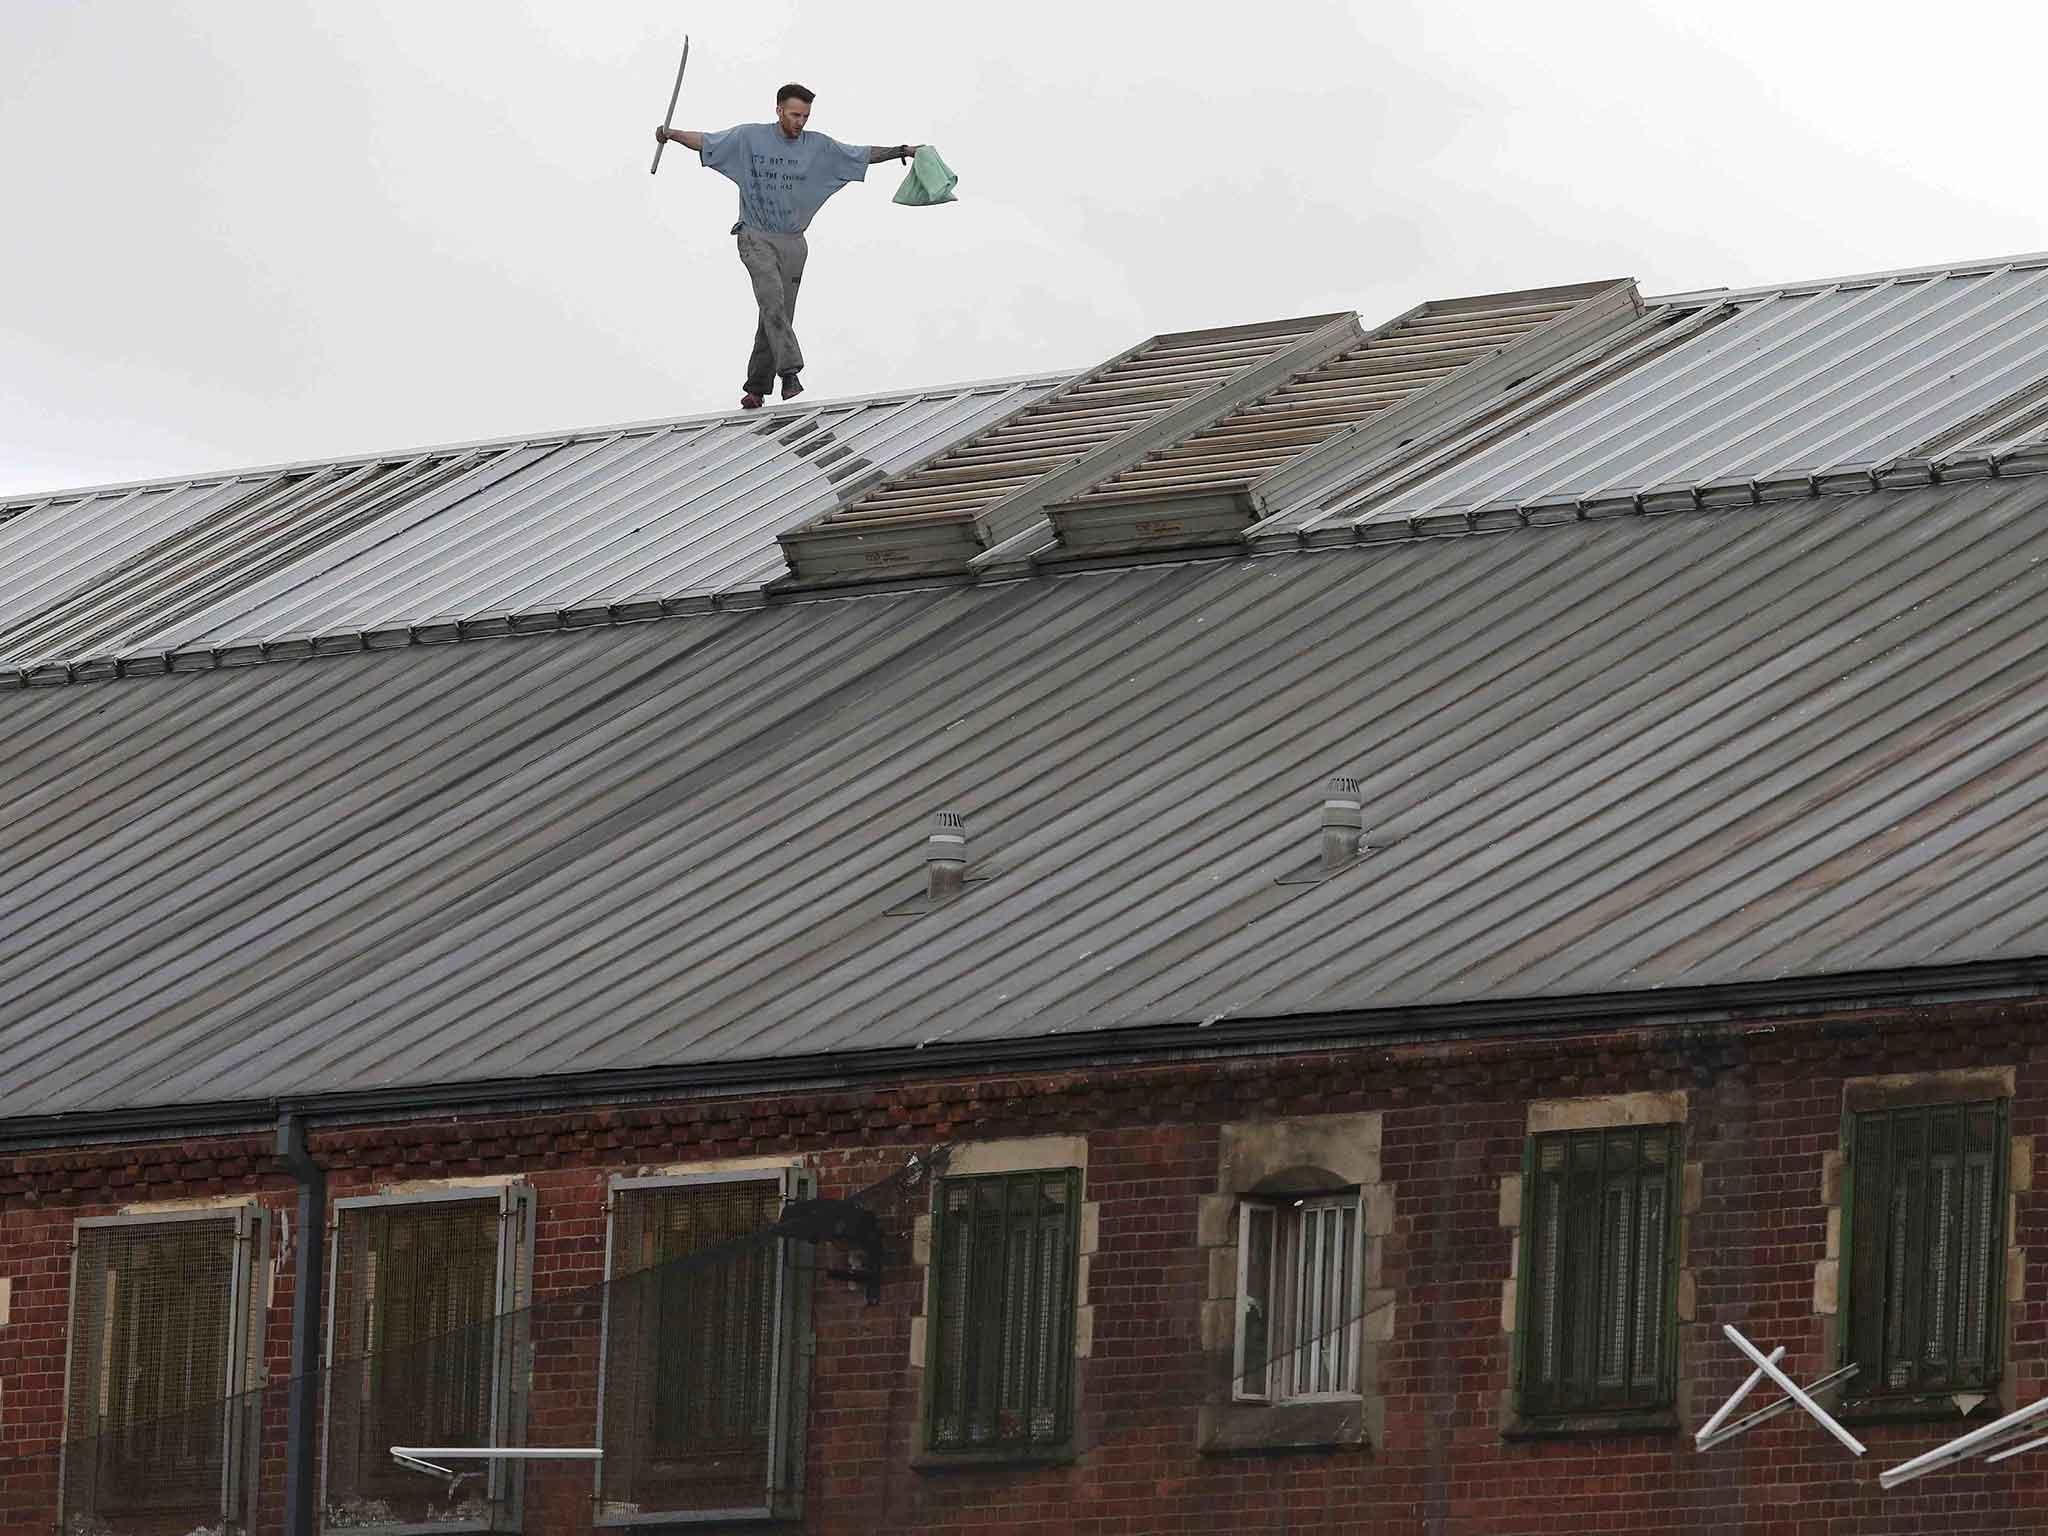 Strangeways: Convicted killer Stuart Horner continues rooftop ...